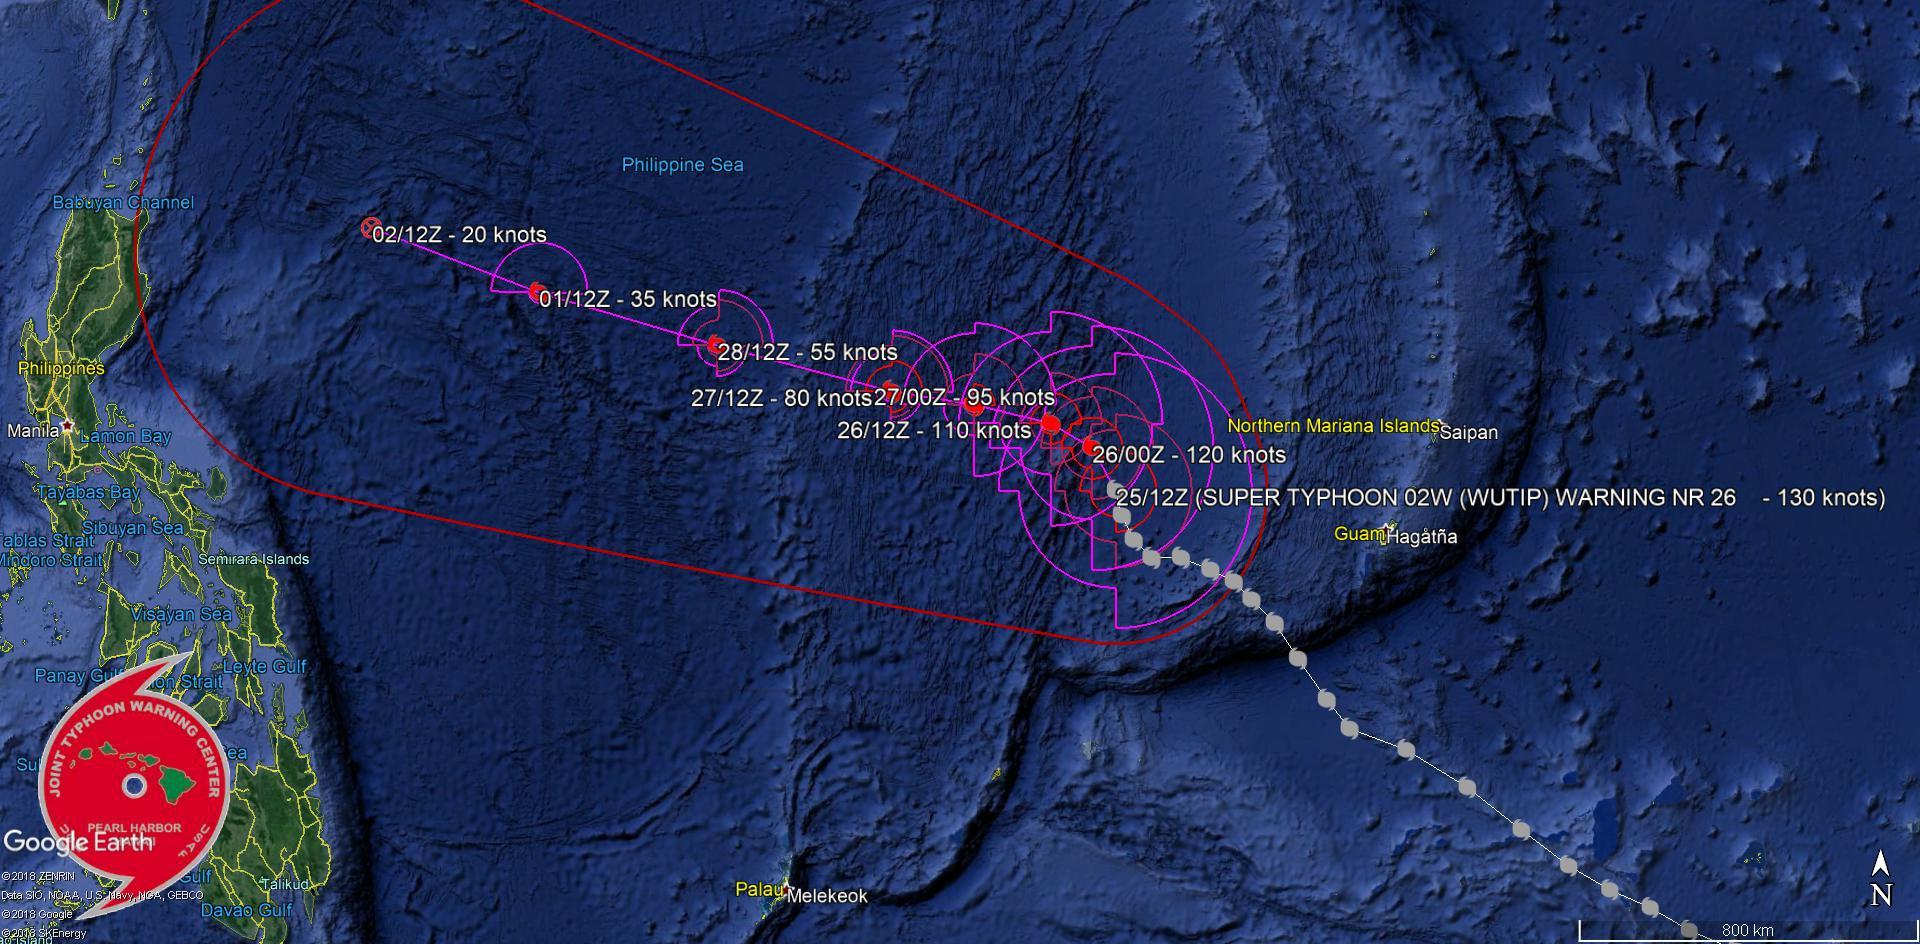 WARNING 26/JTWC